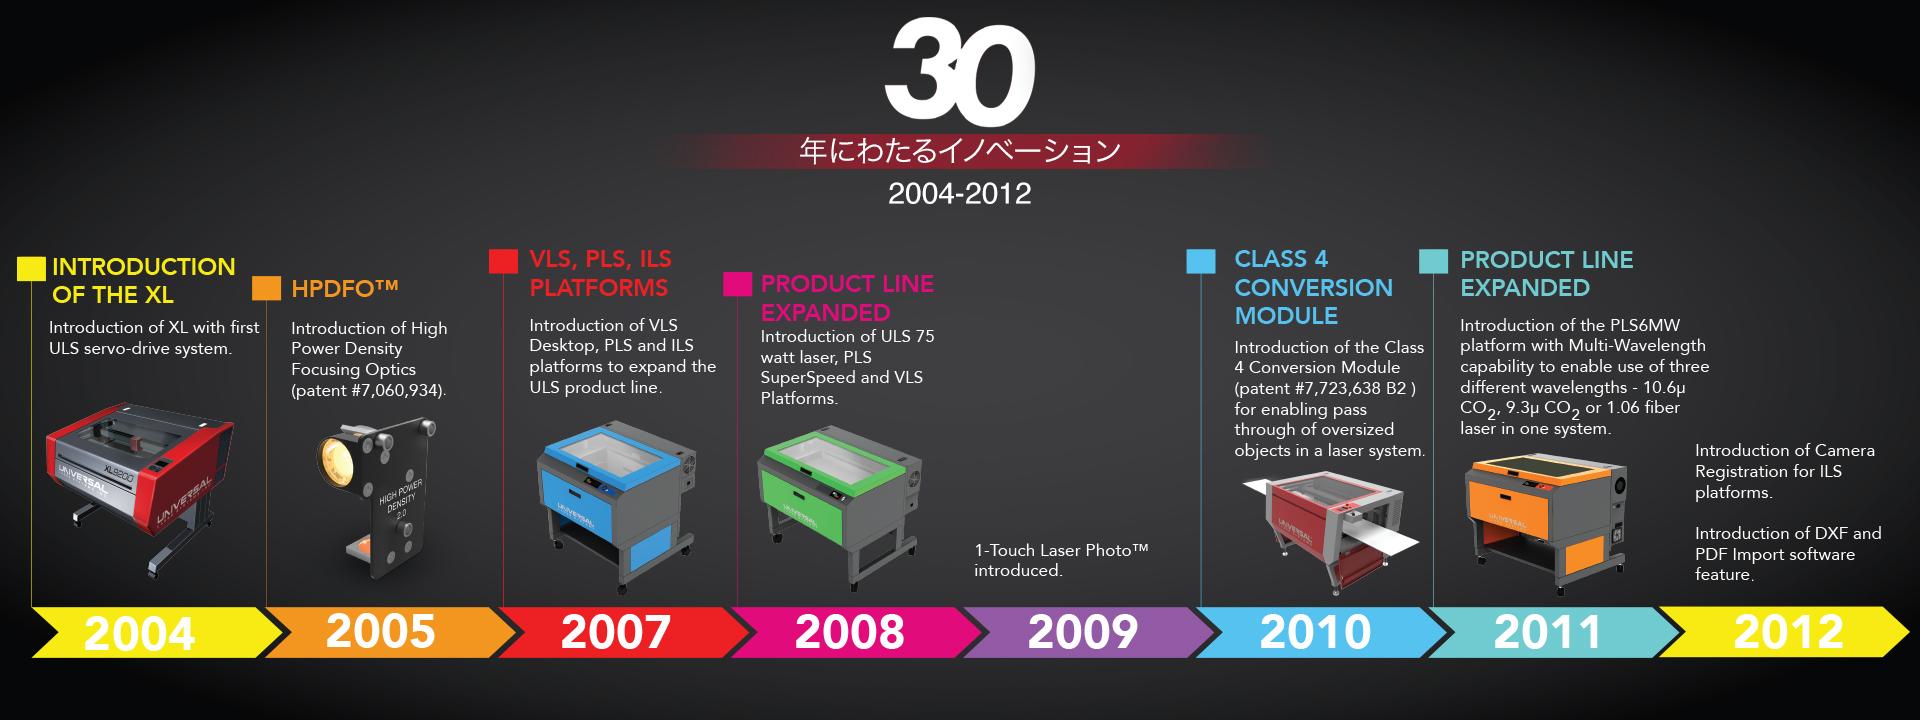 ULS Japanese Timeline 3